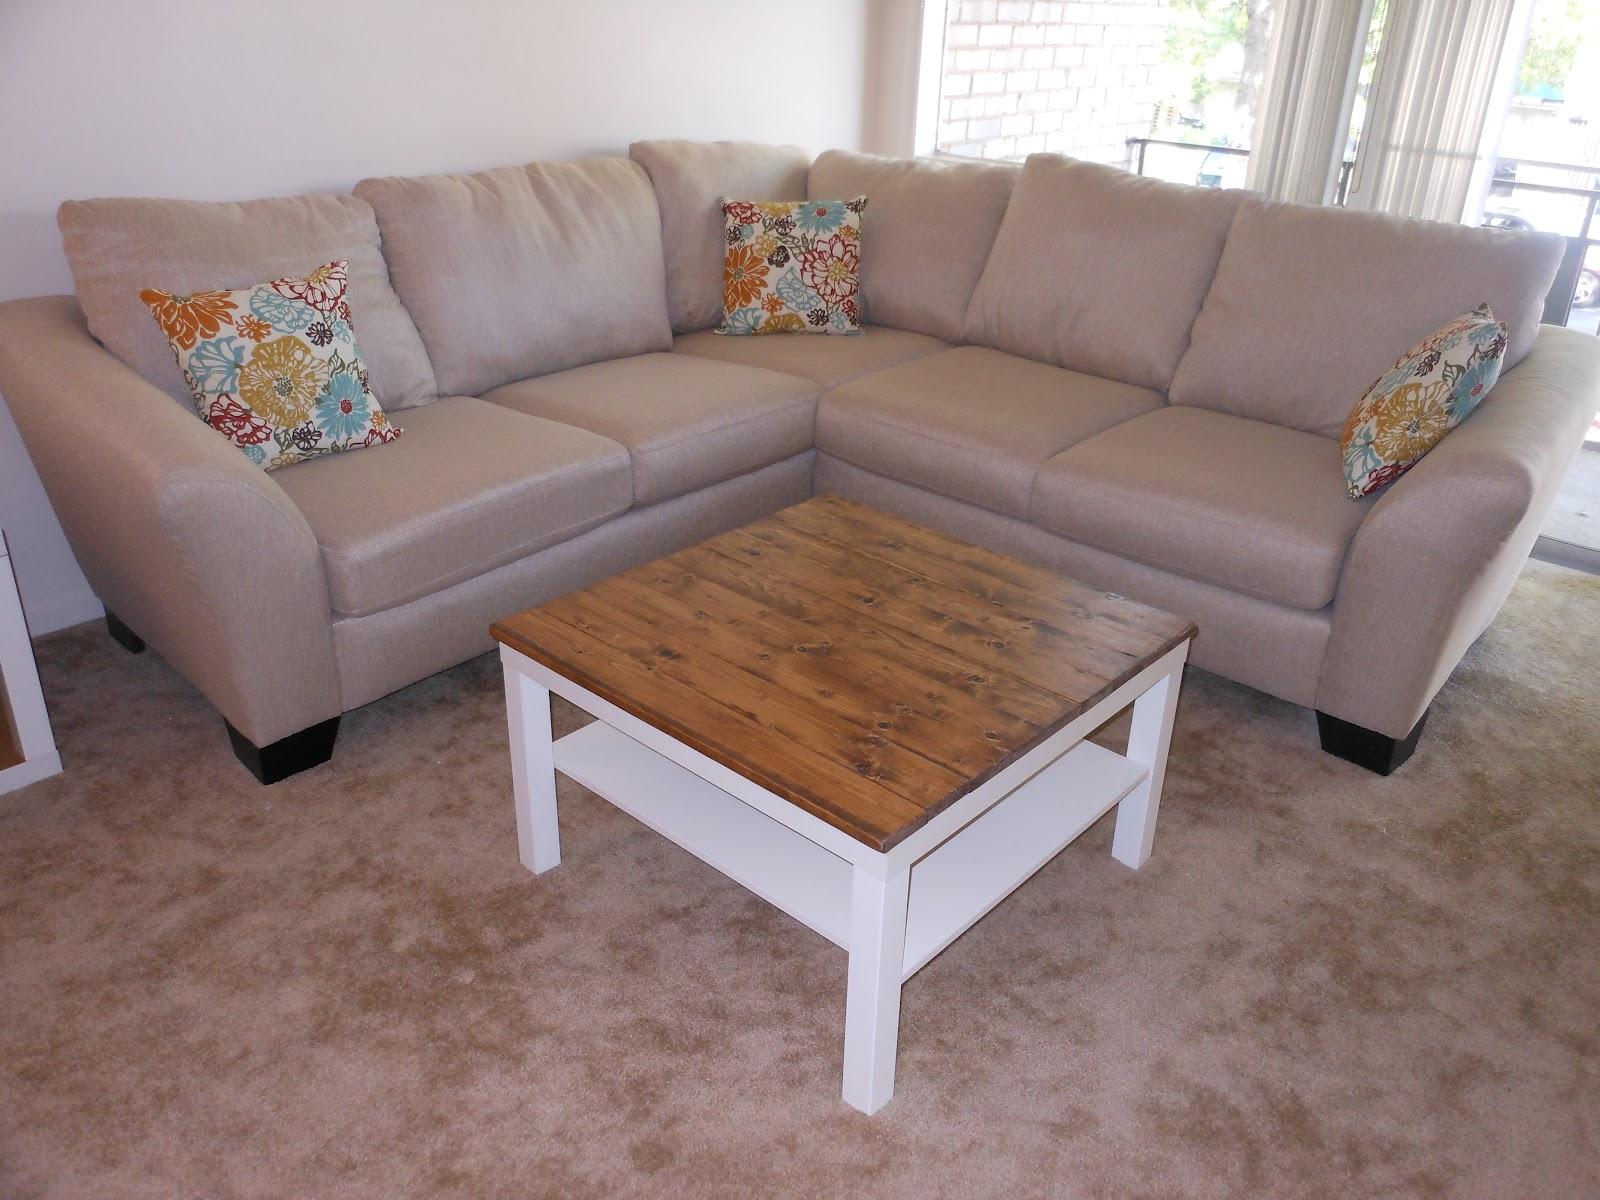 Decor dilettante ikea lack coffee table re do - Ikea table lack ...